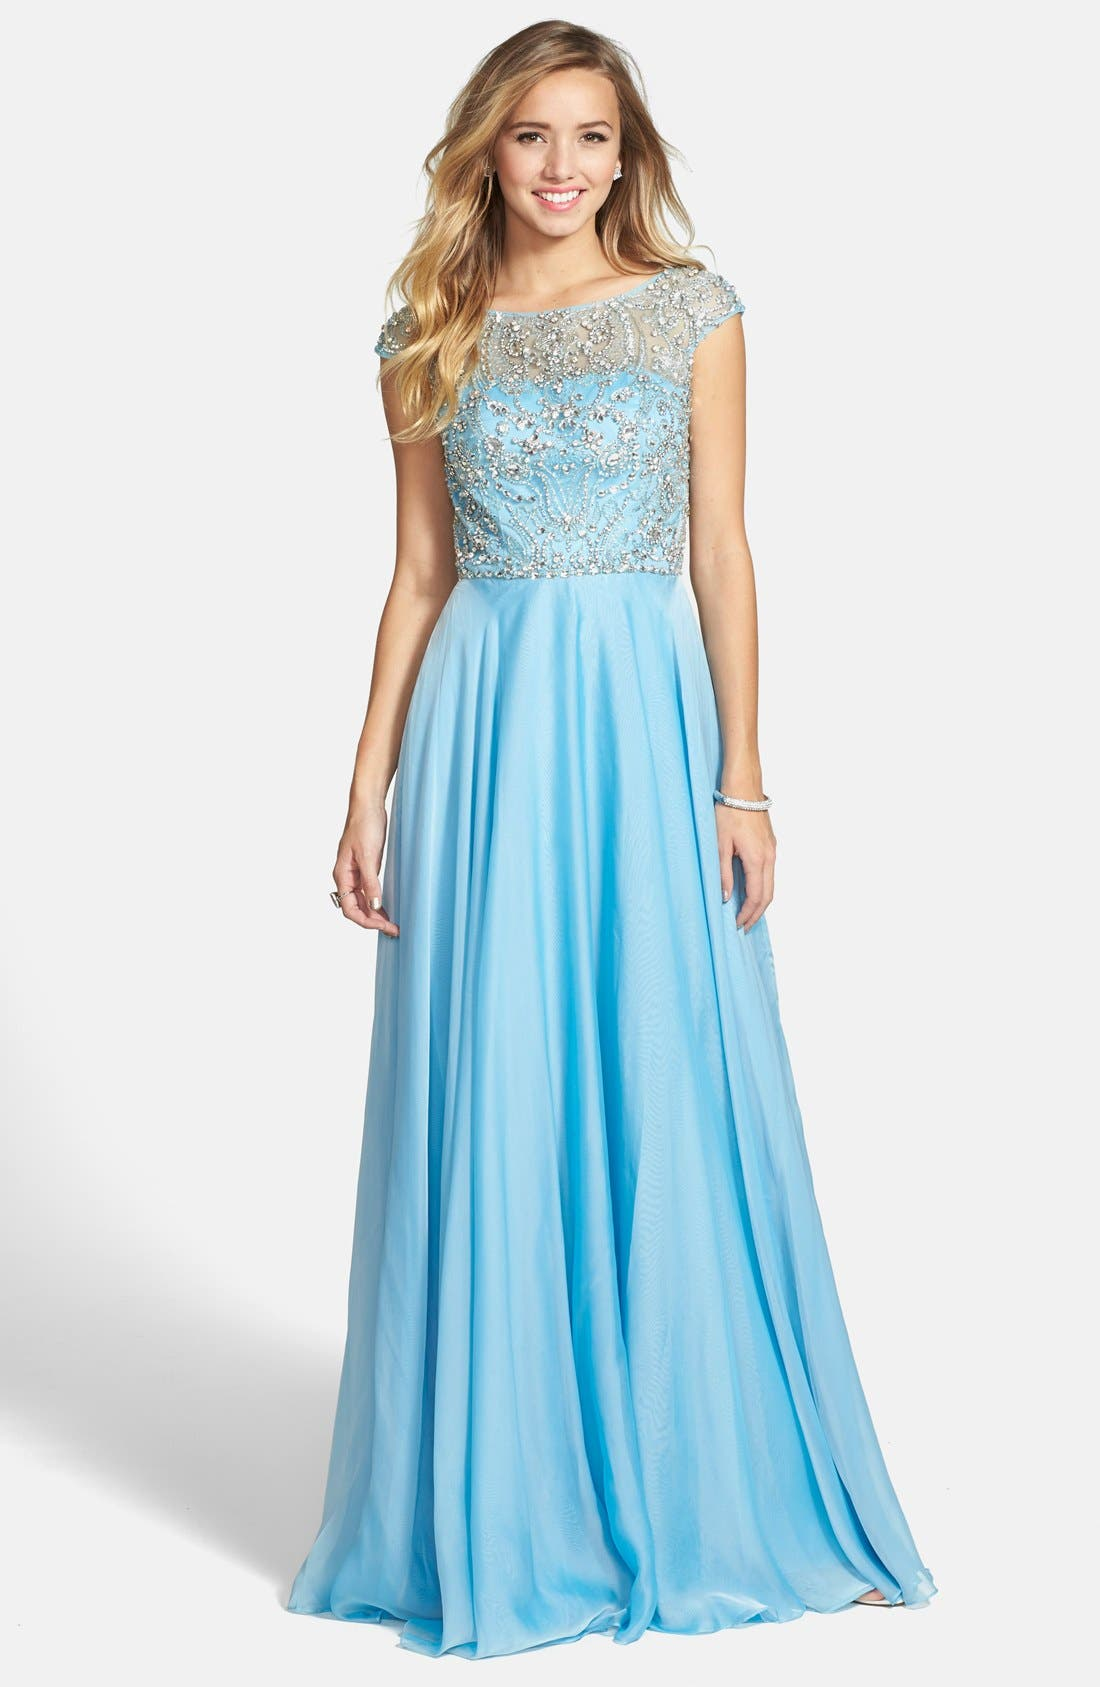 Alternate Image 1 Selected - Sherri Hill Embellished Illusion Bodice Gown